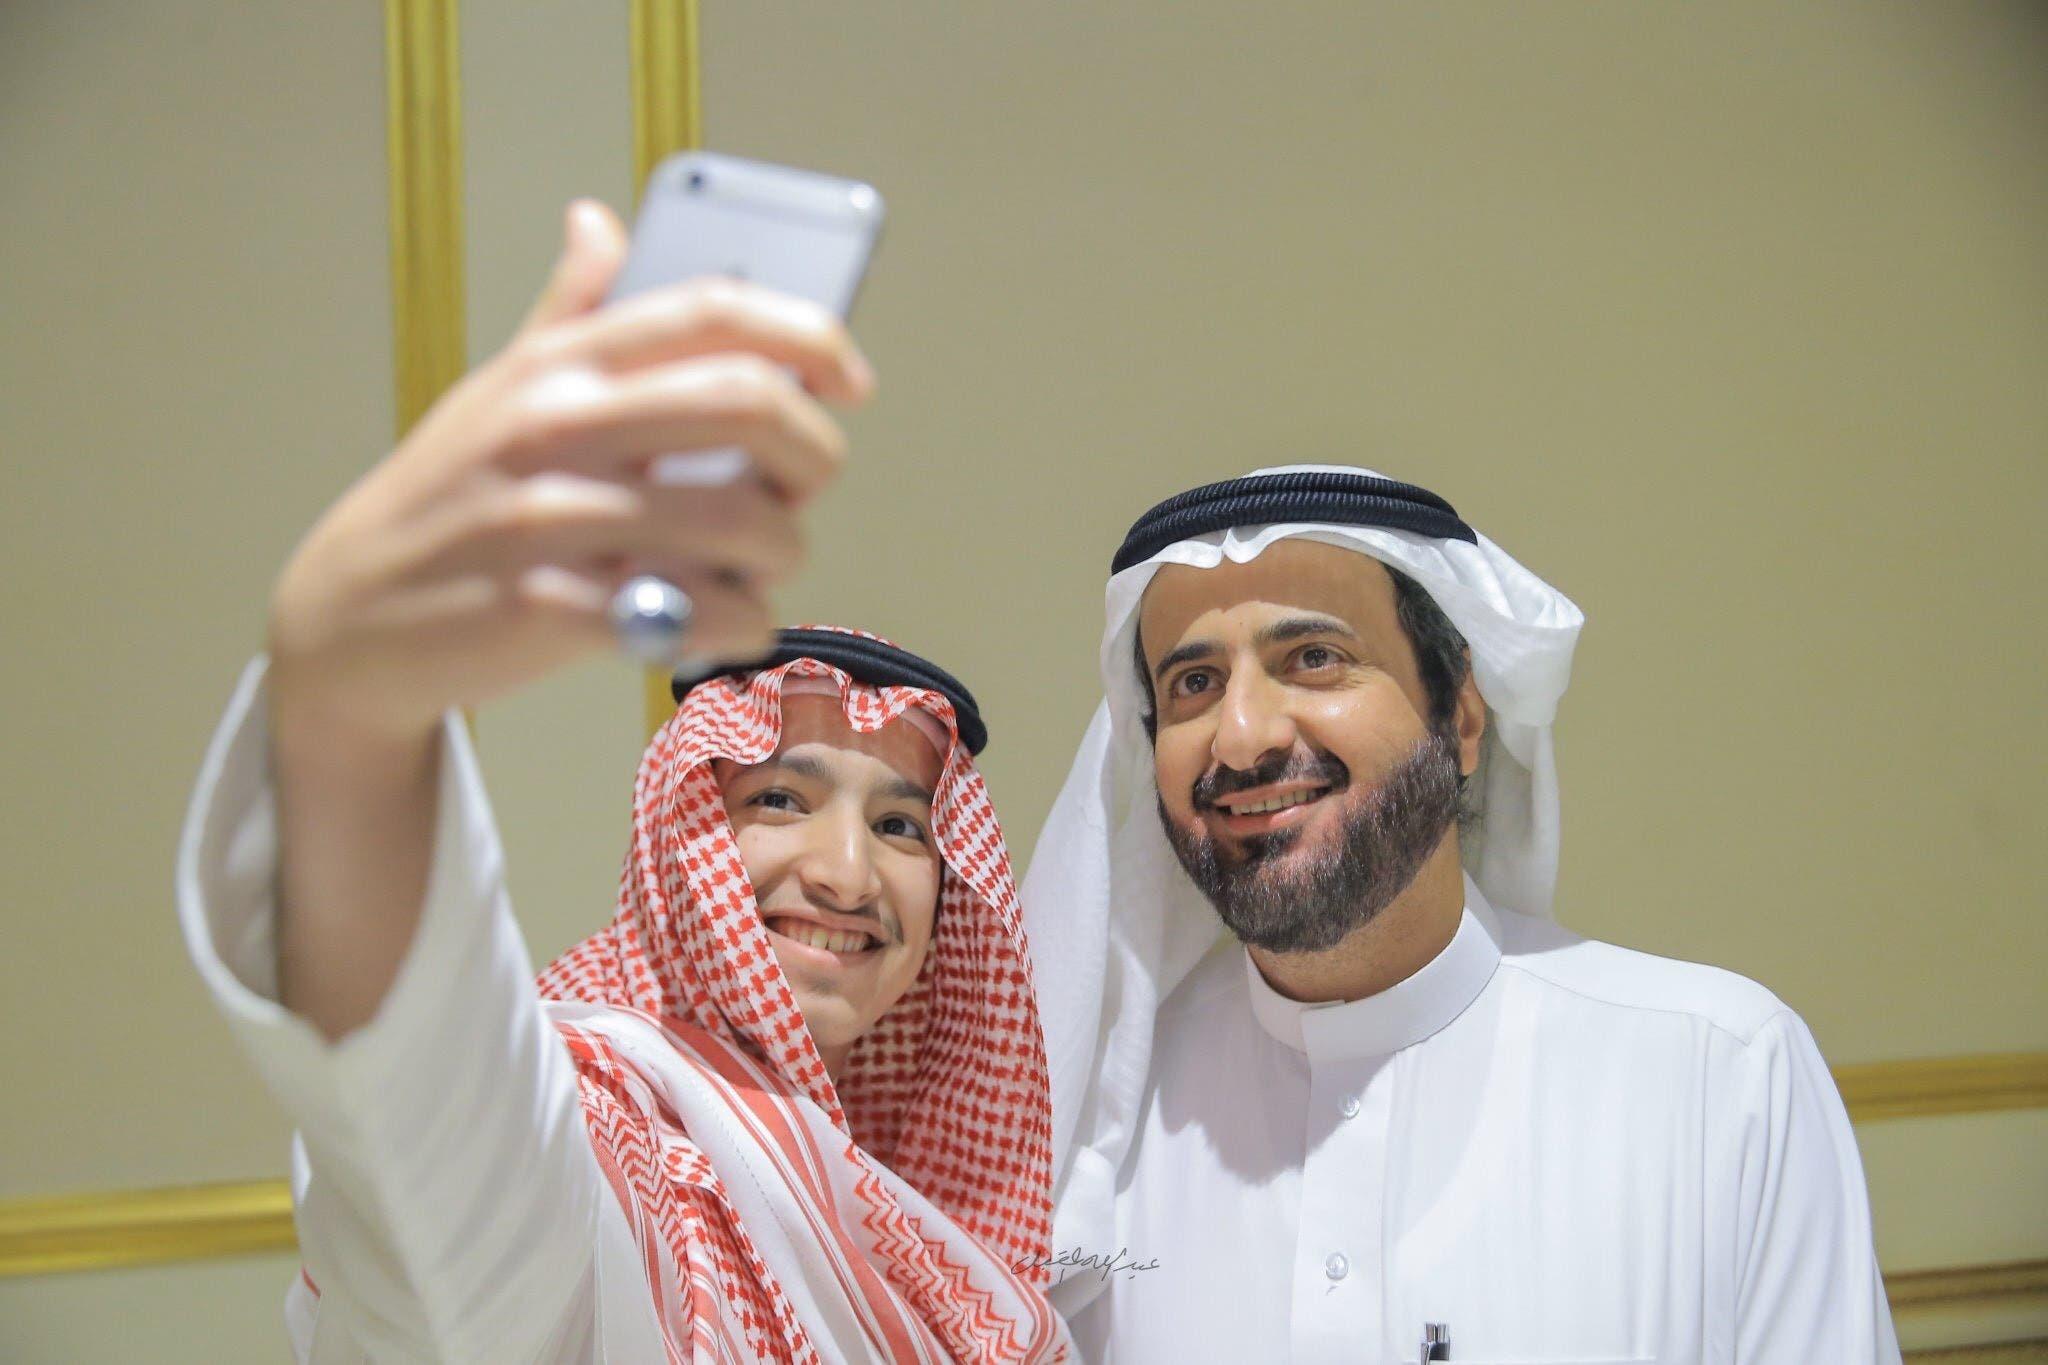 شاب سعودي يتبرع بكبده